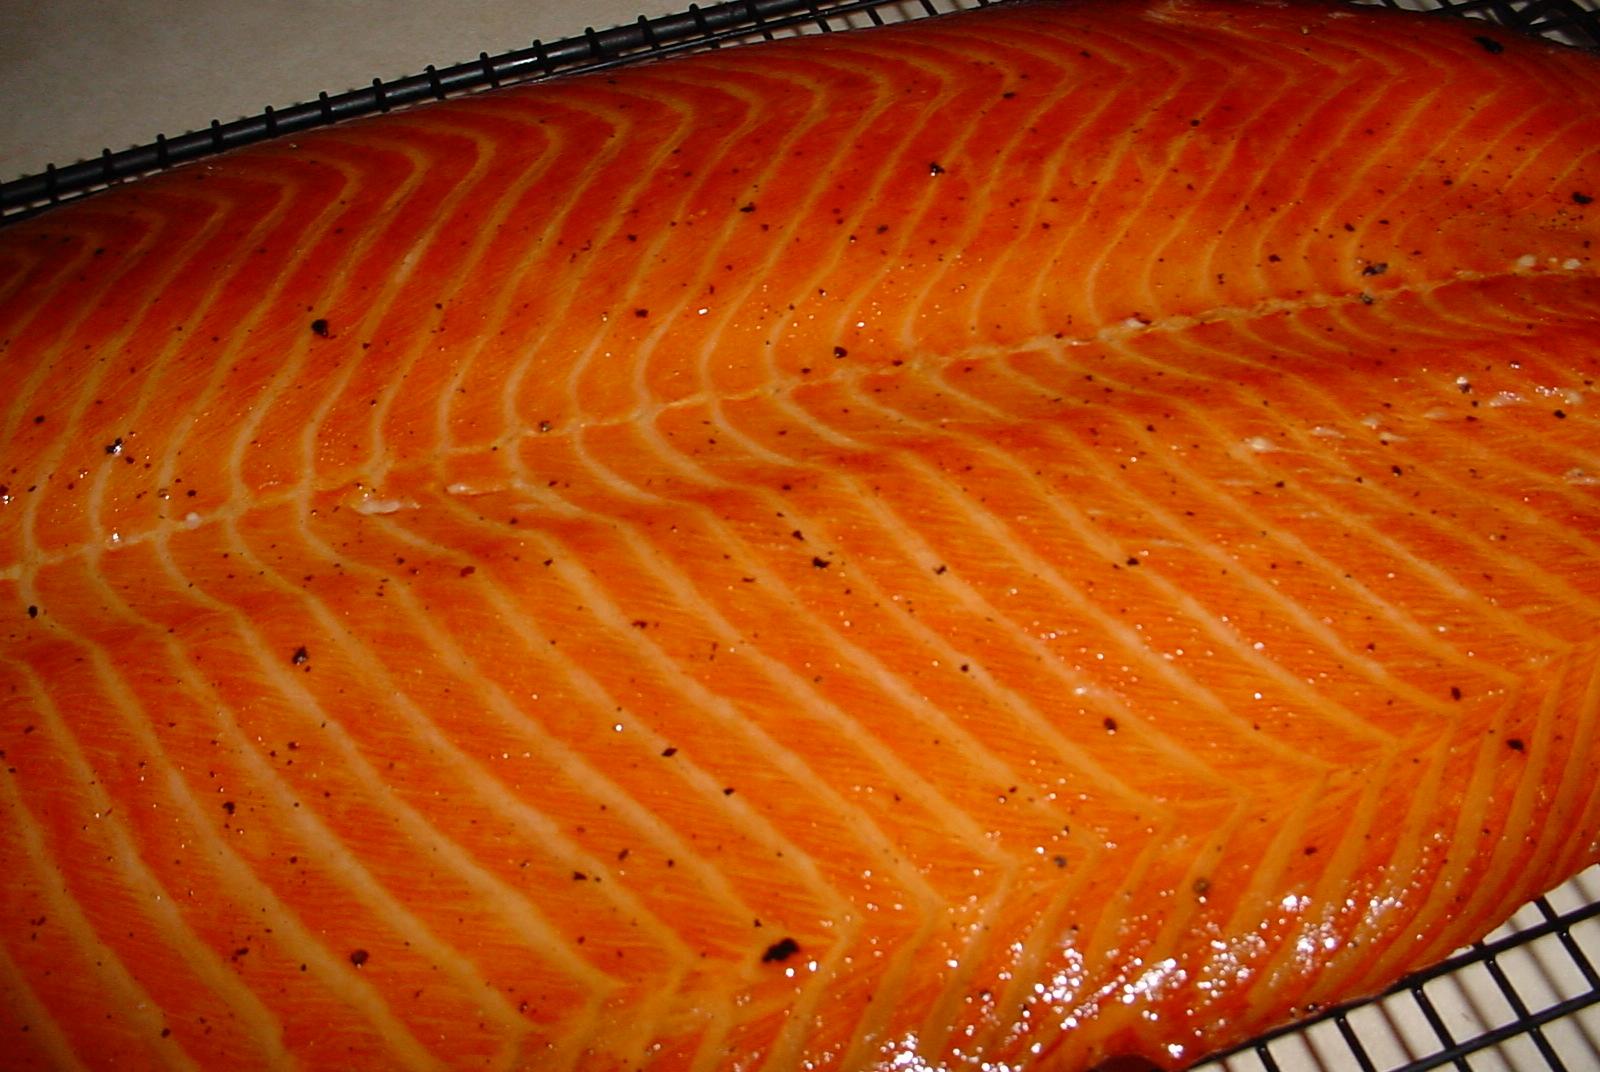 Kearby 39 s kitchen smoked salmon recipe for Smoked fish recipe